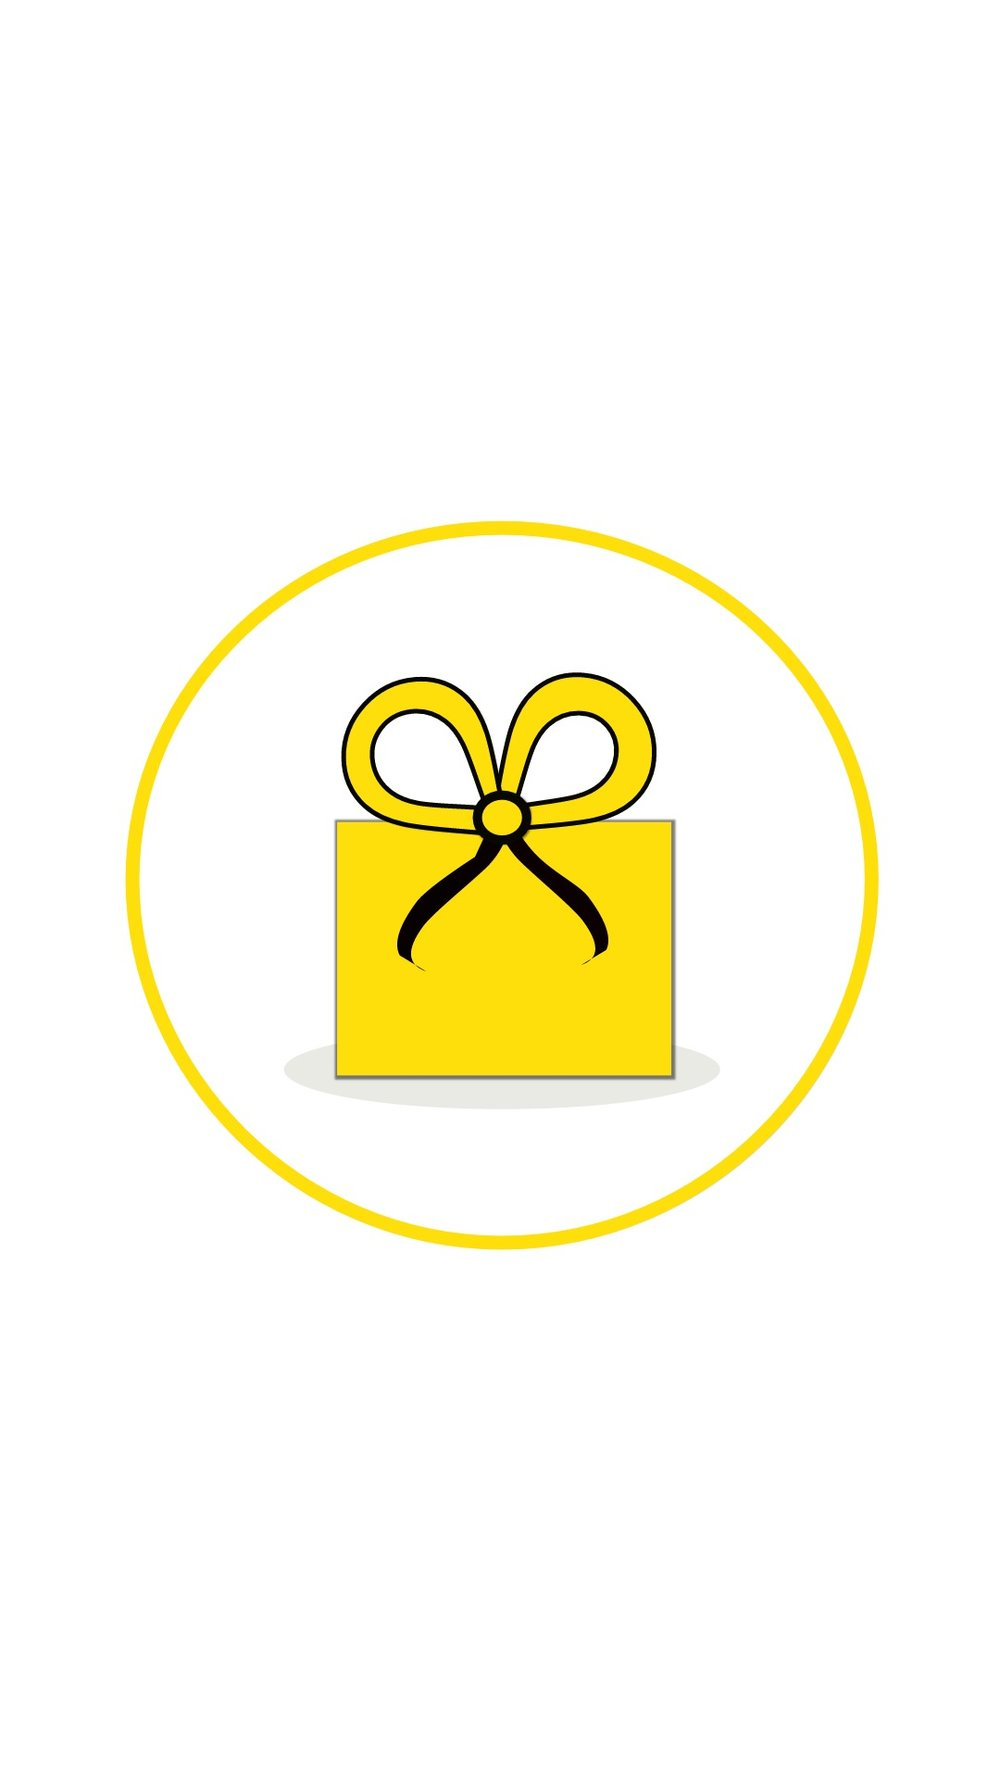 Instagram-cover-box-yellow-white-lotnotes.com.jpg